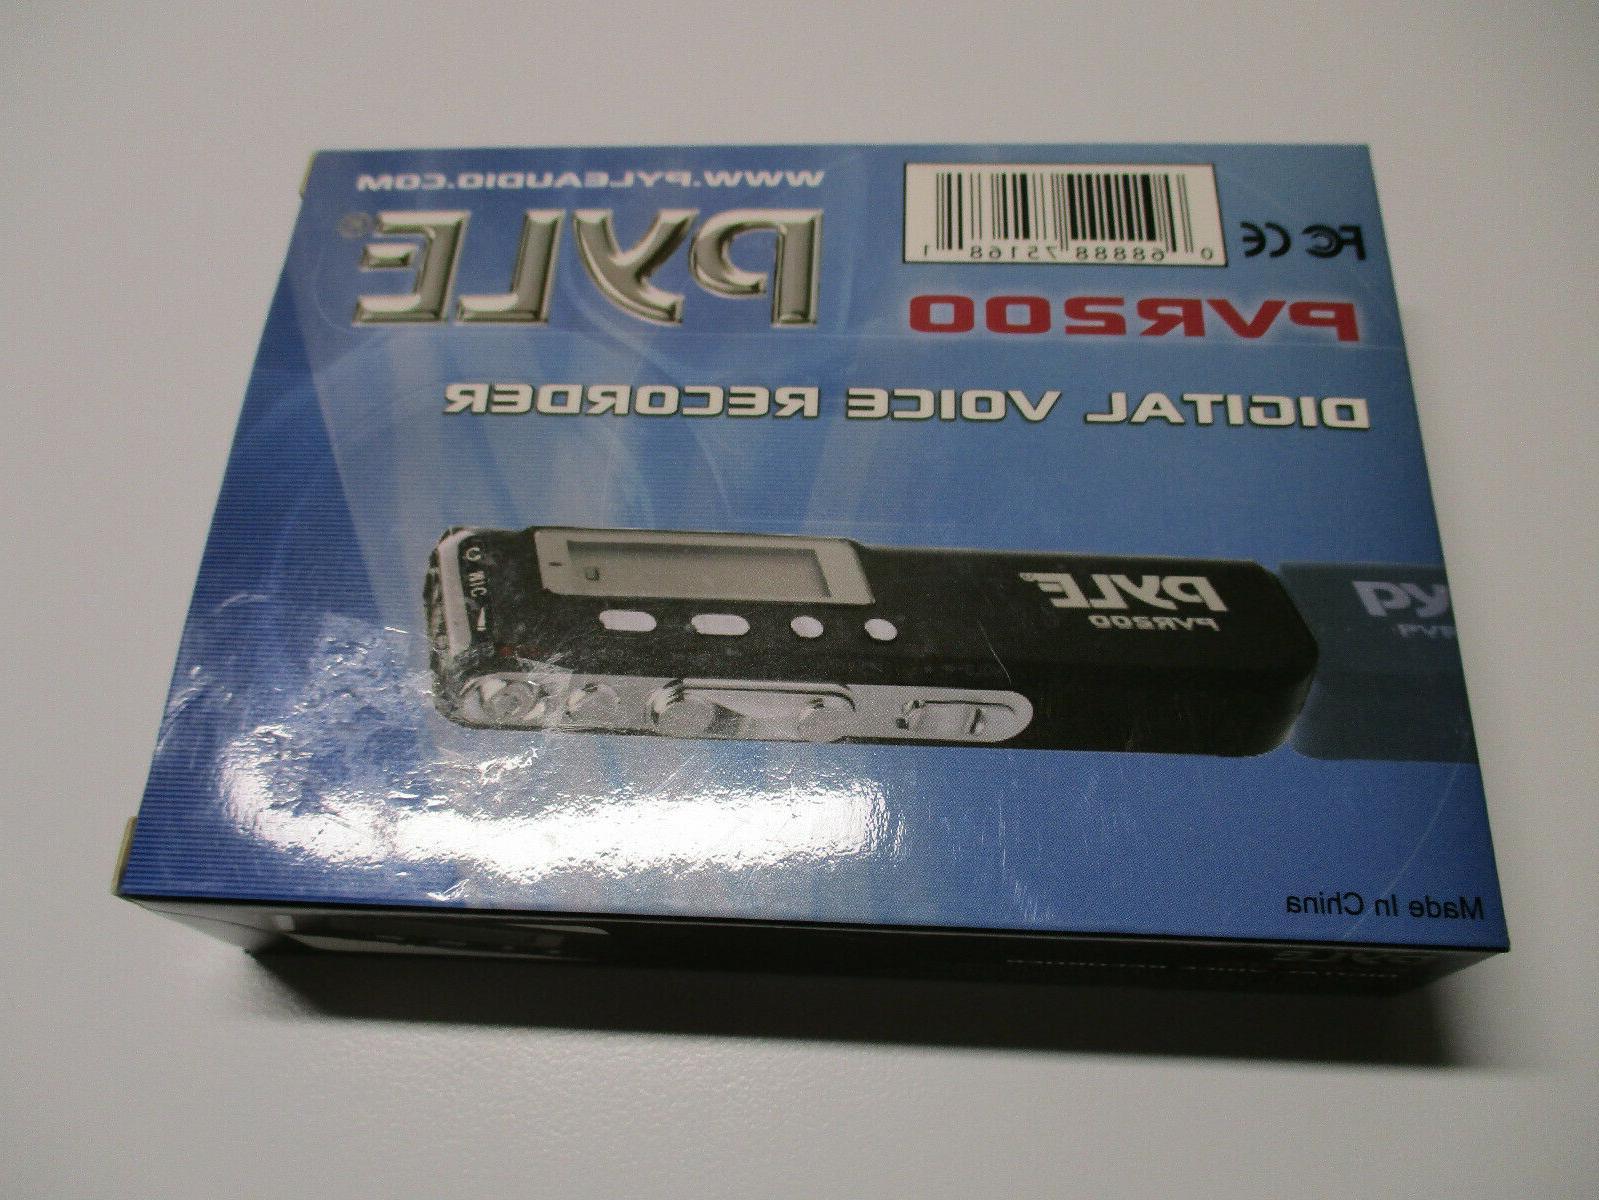 pvr200 4gb digital lcd voice recorder headphone